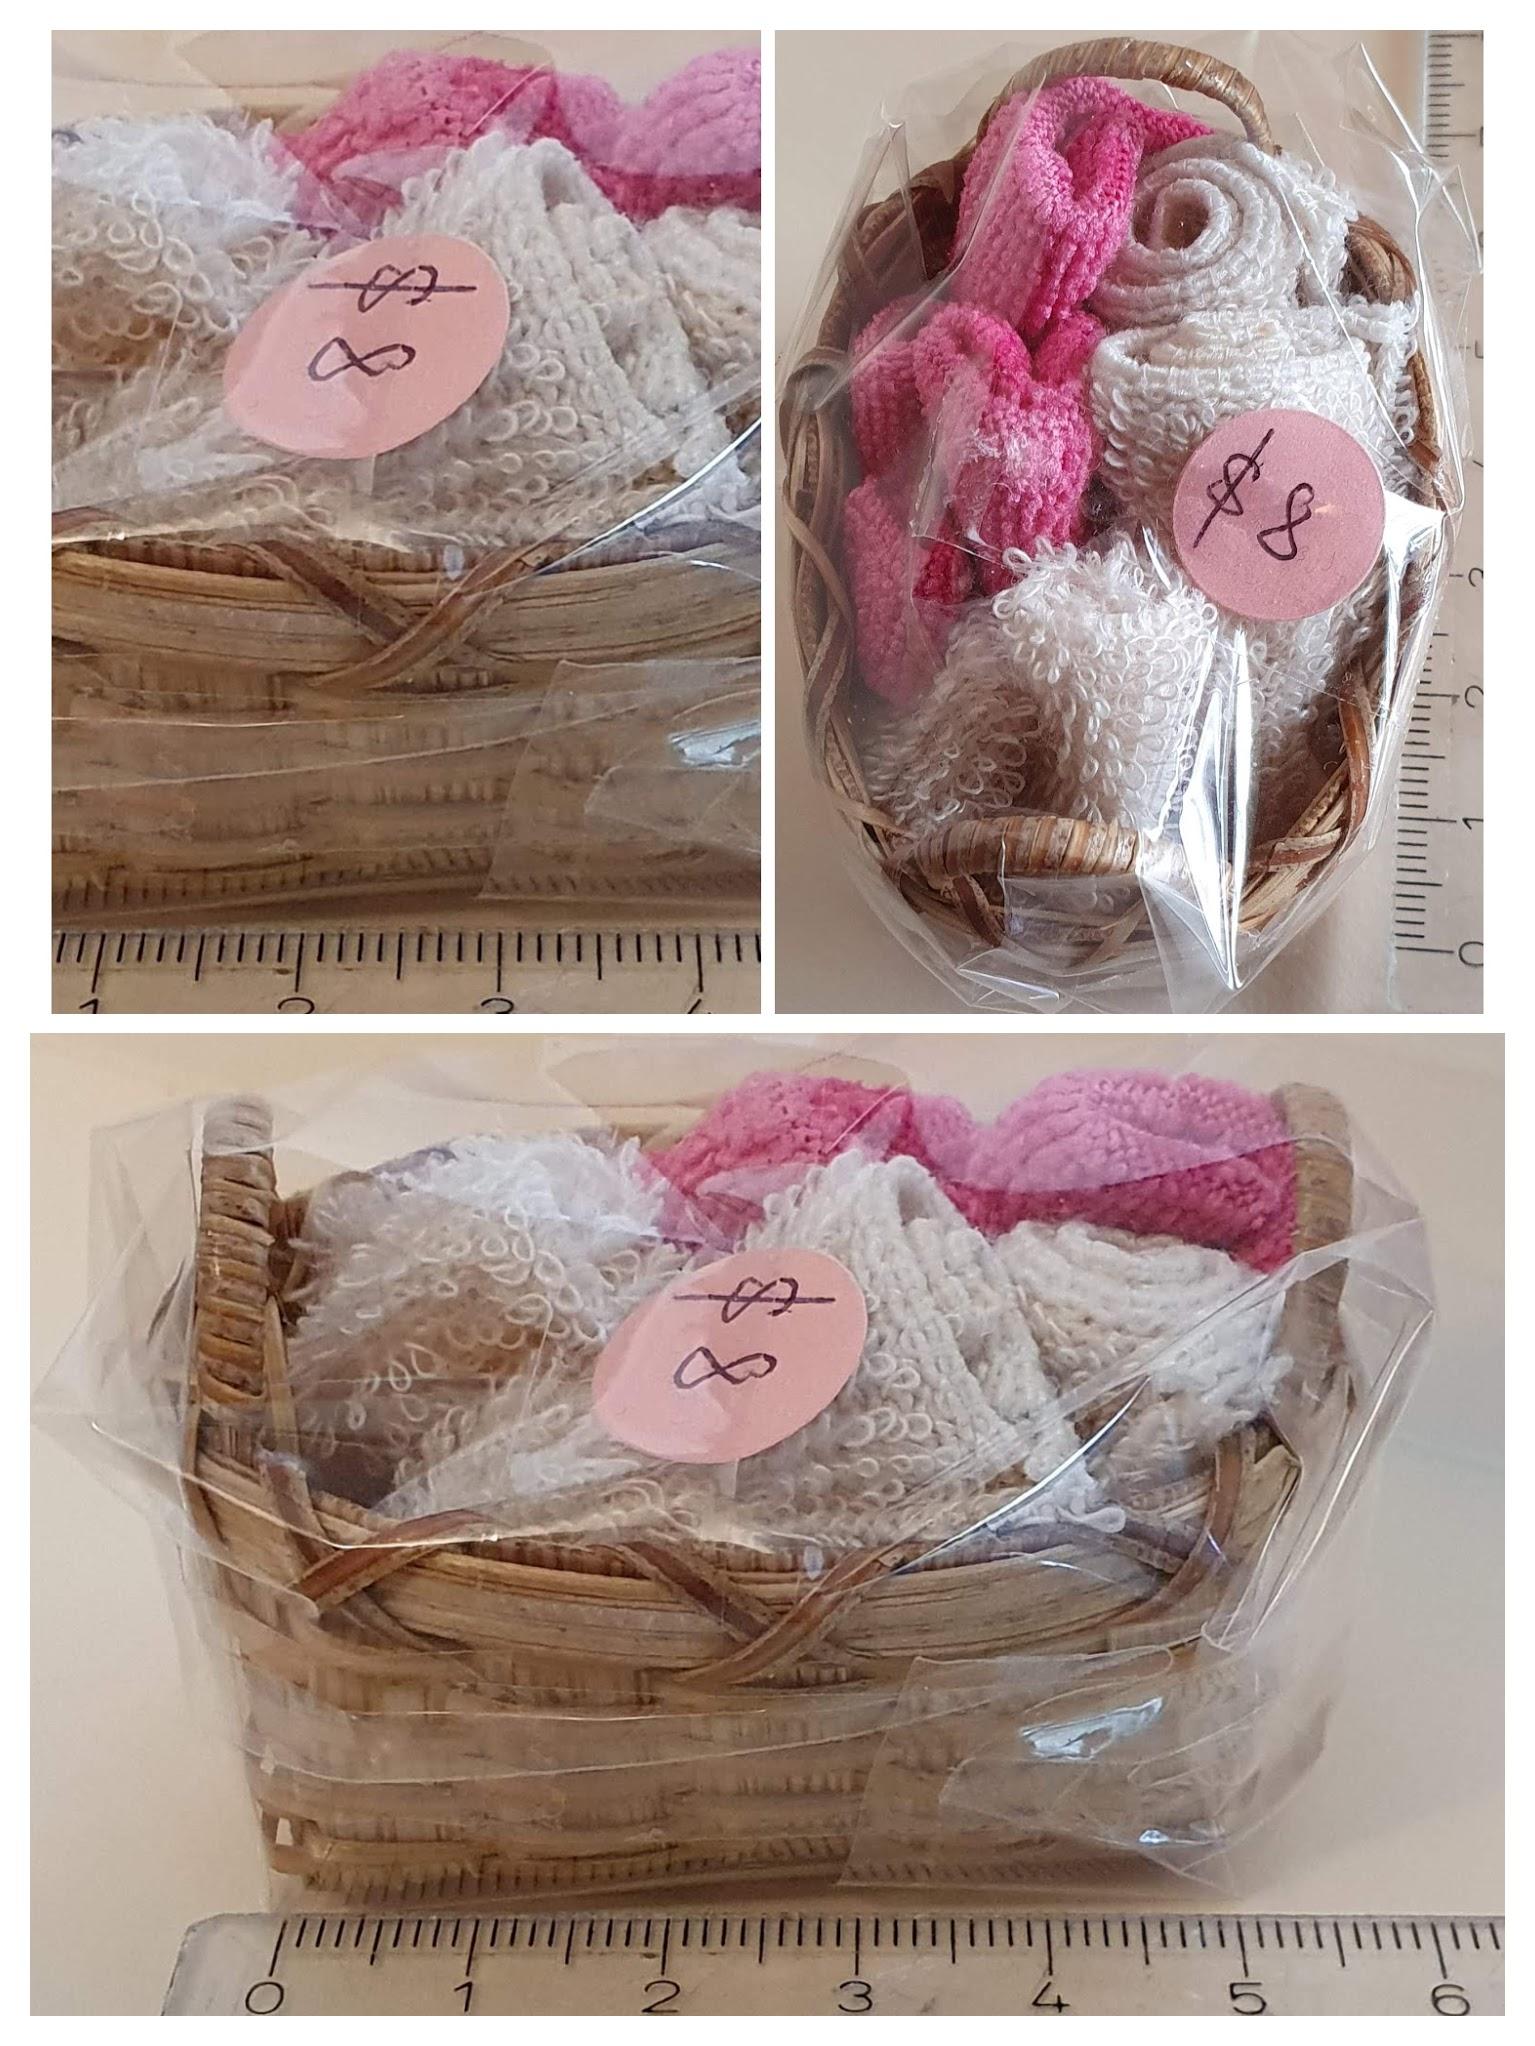 Laundry basket w towels $8